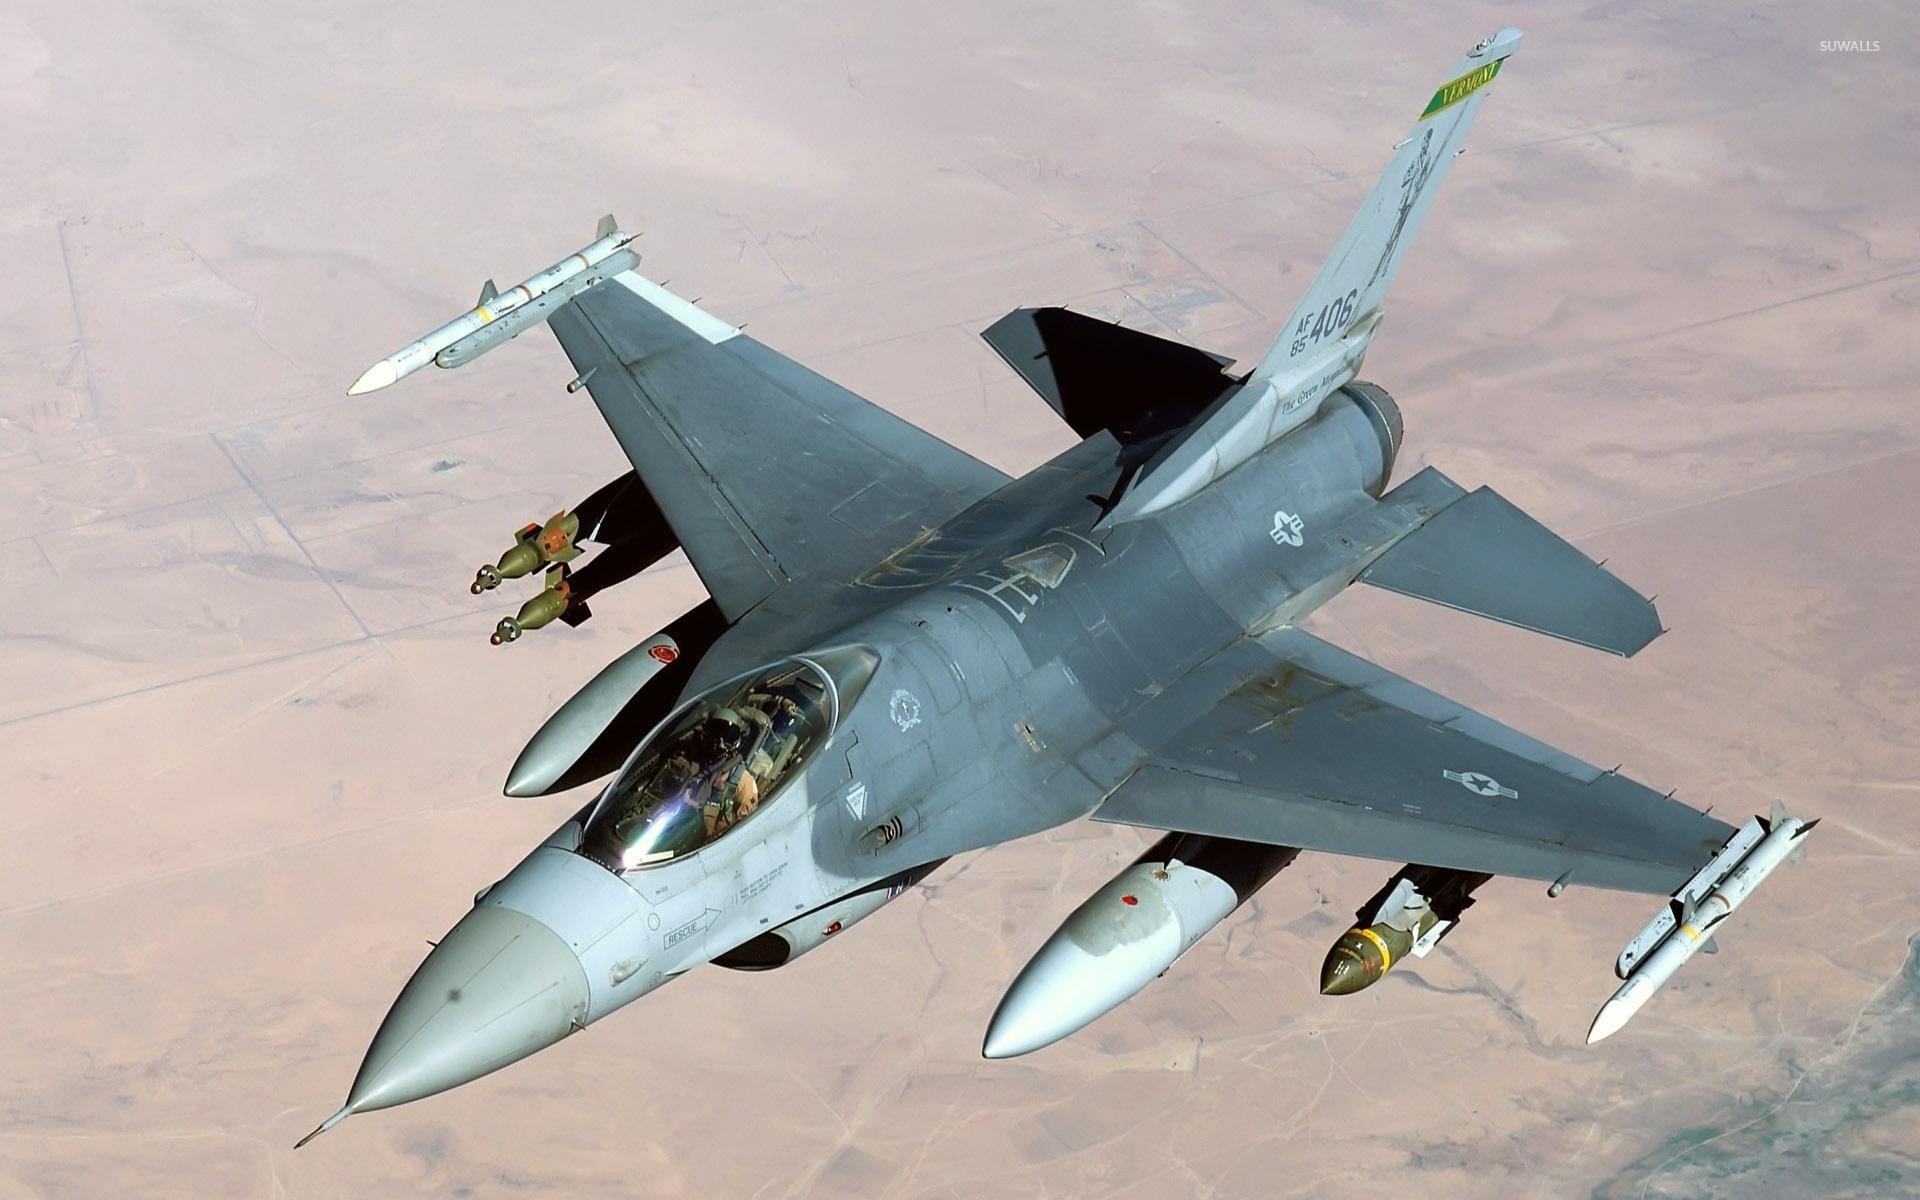 General Dynamics F-16 Fighting Falcon [9] Wallpaper